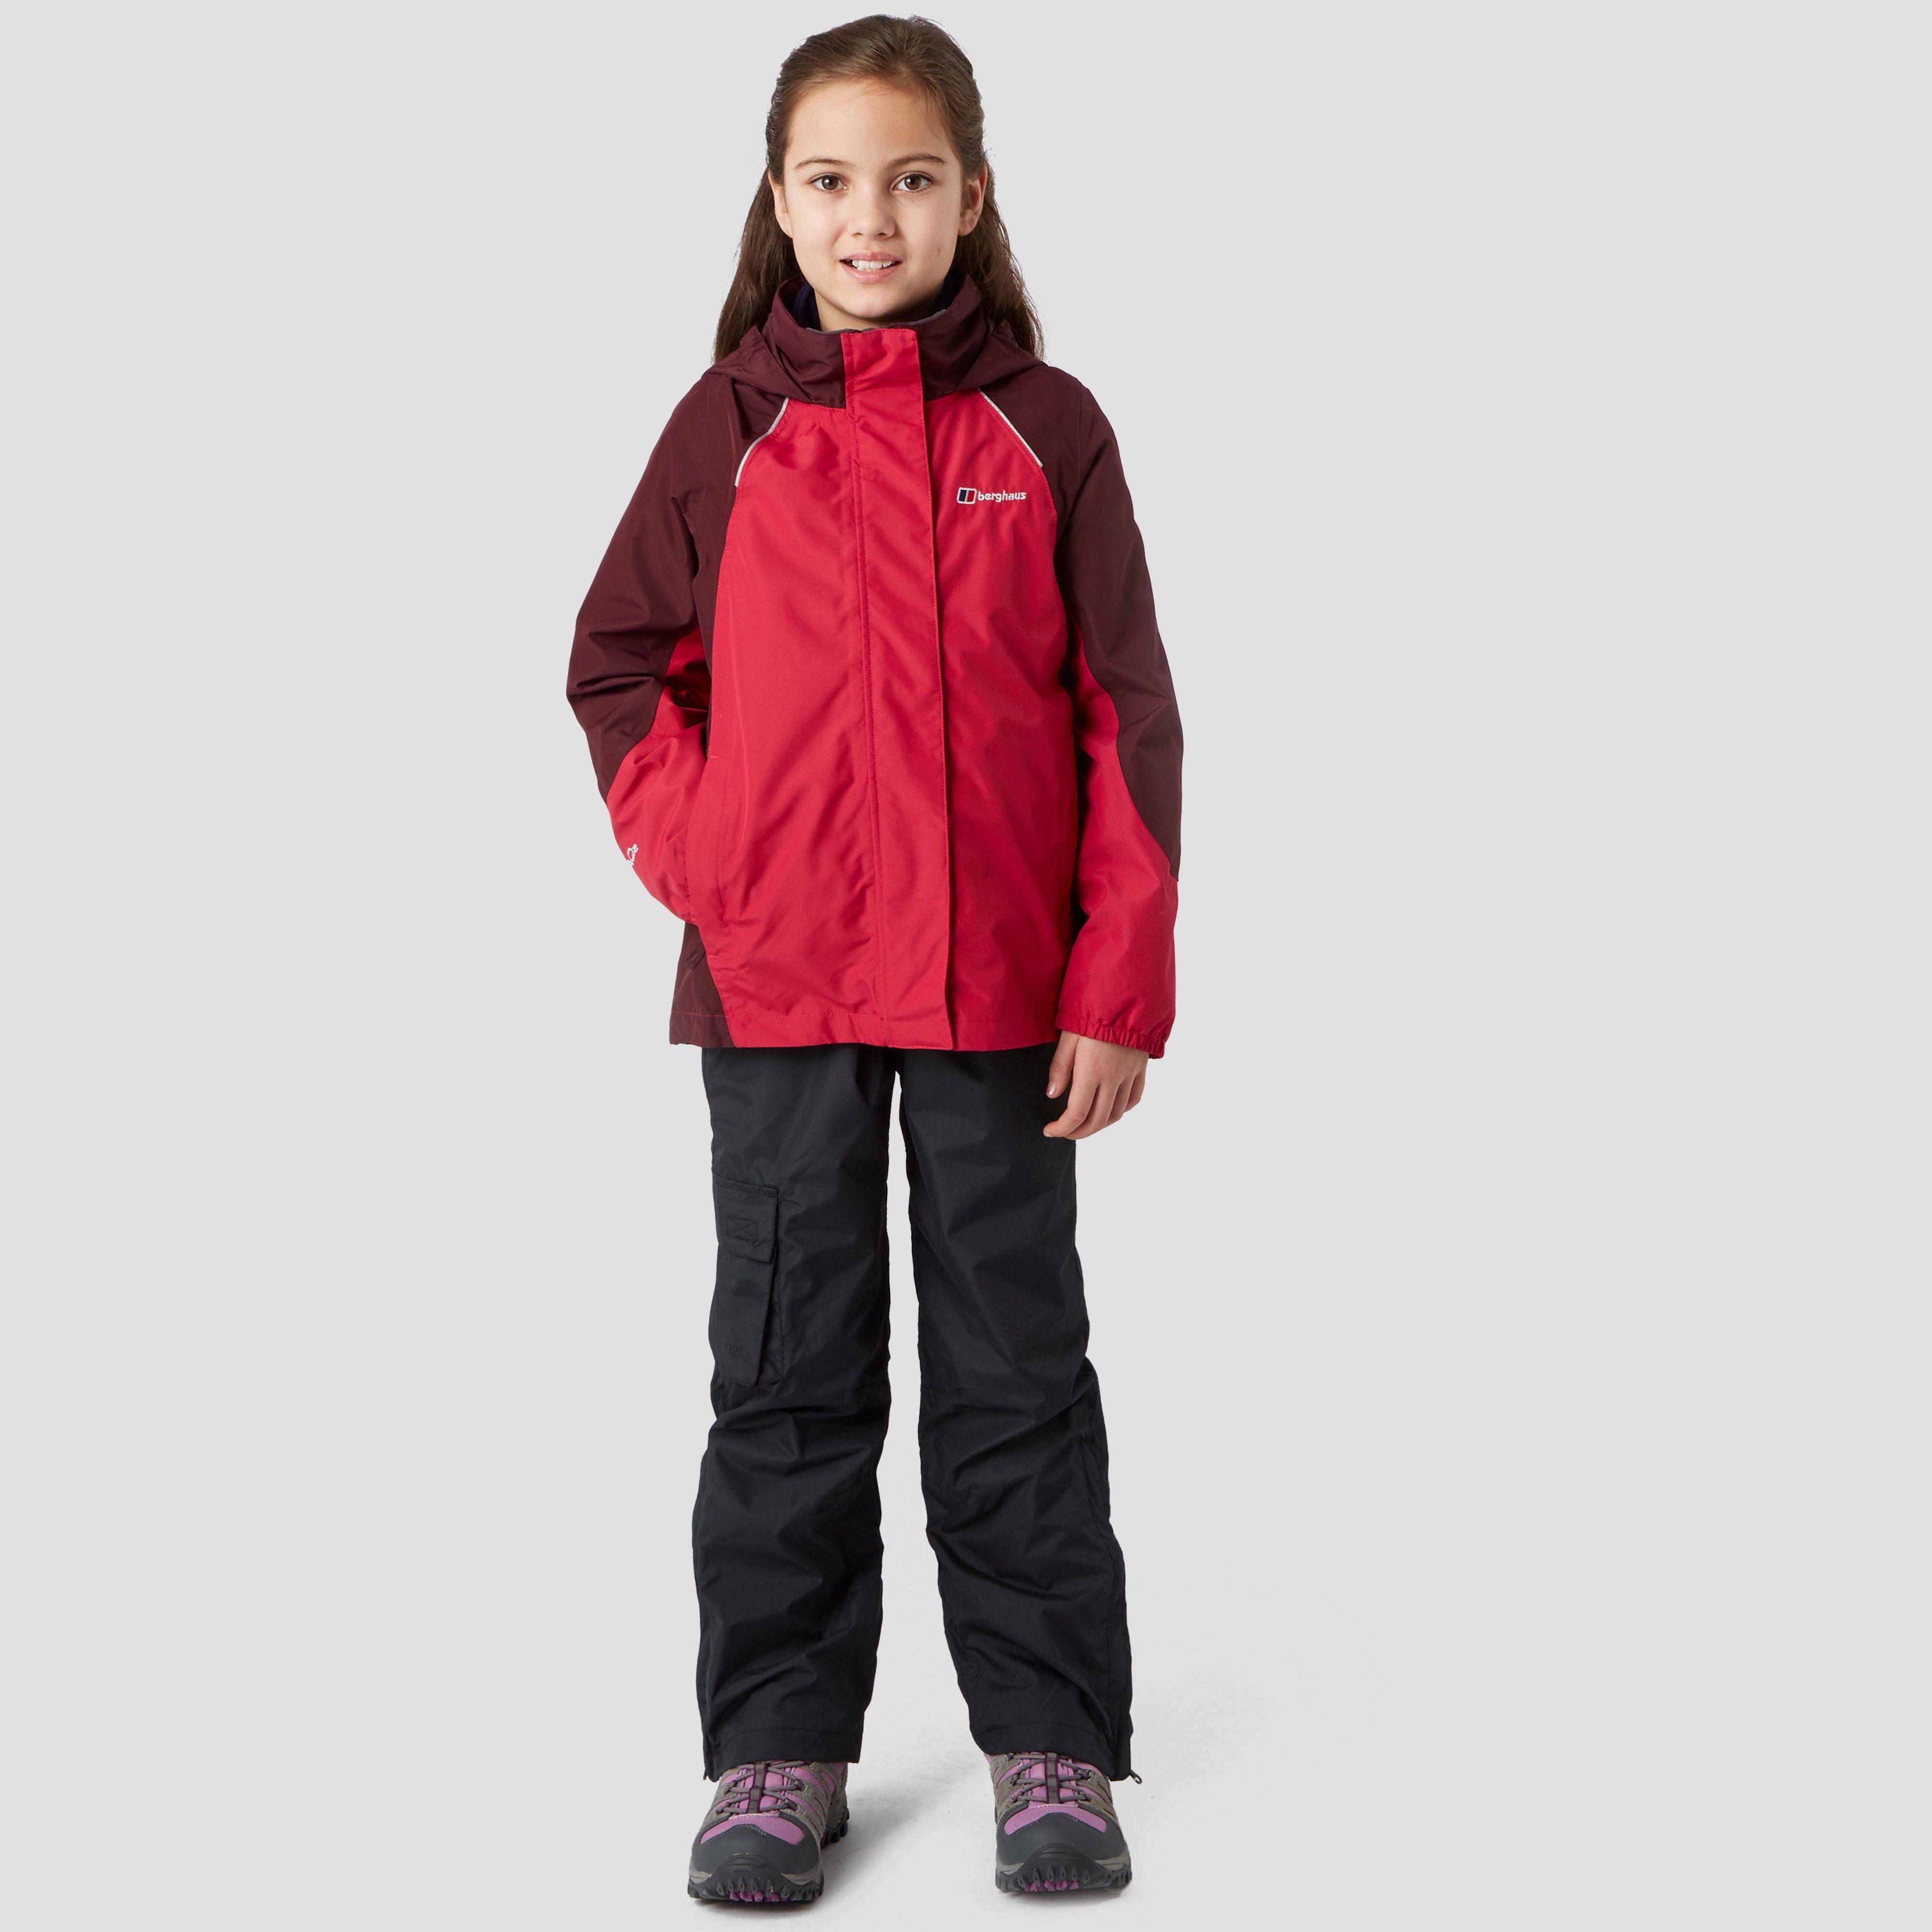 Berghaus Girl's Carrock 3 in 1 Jacket